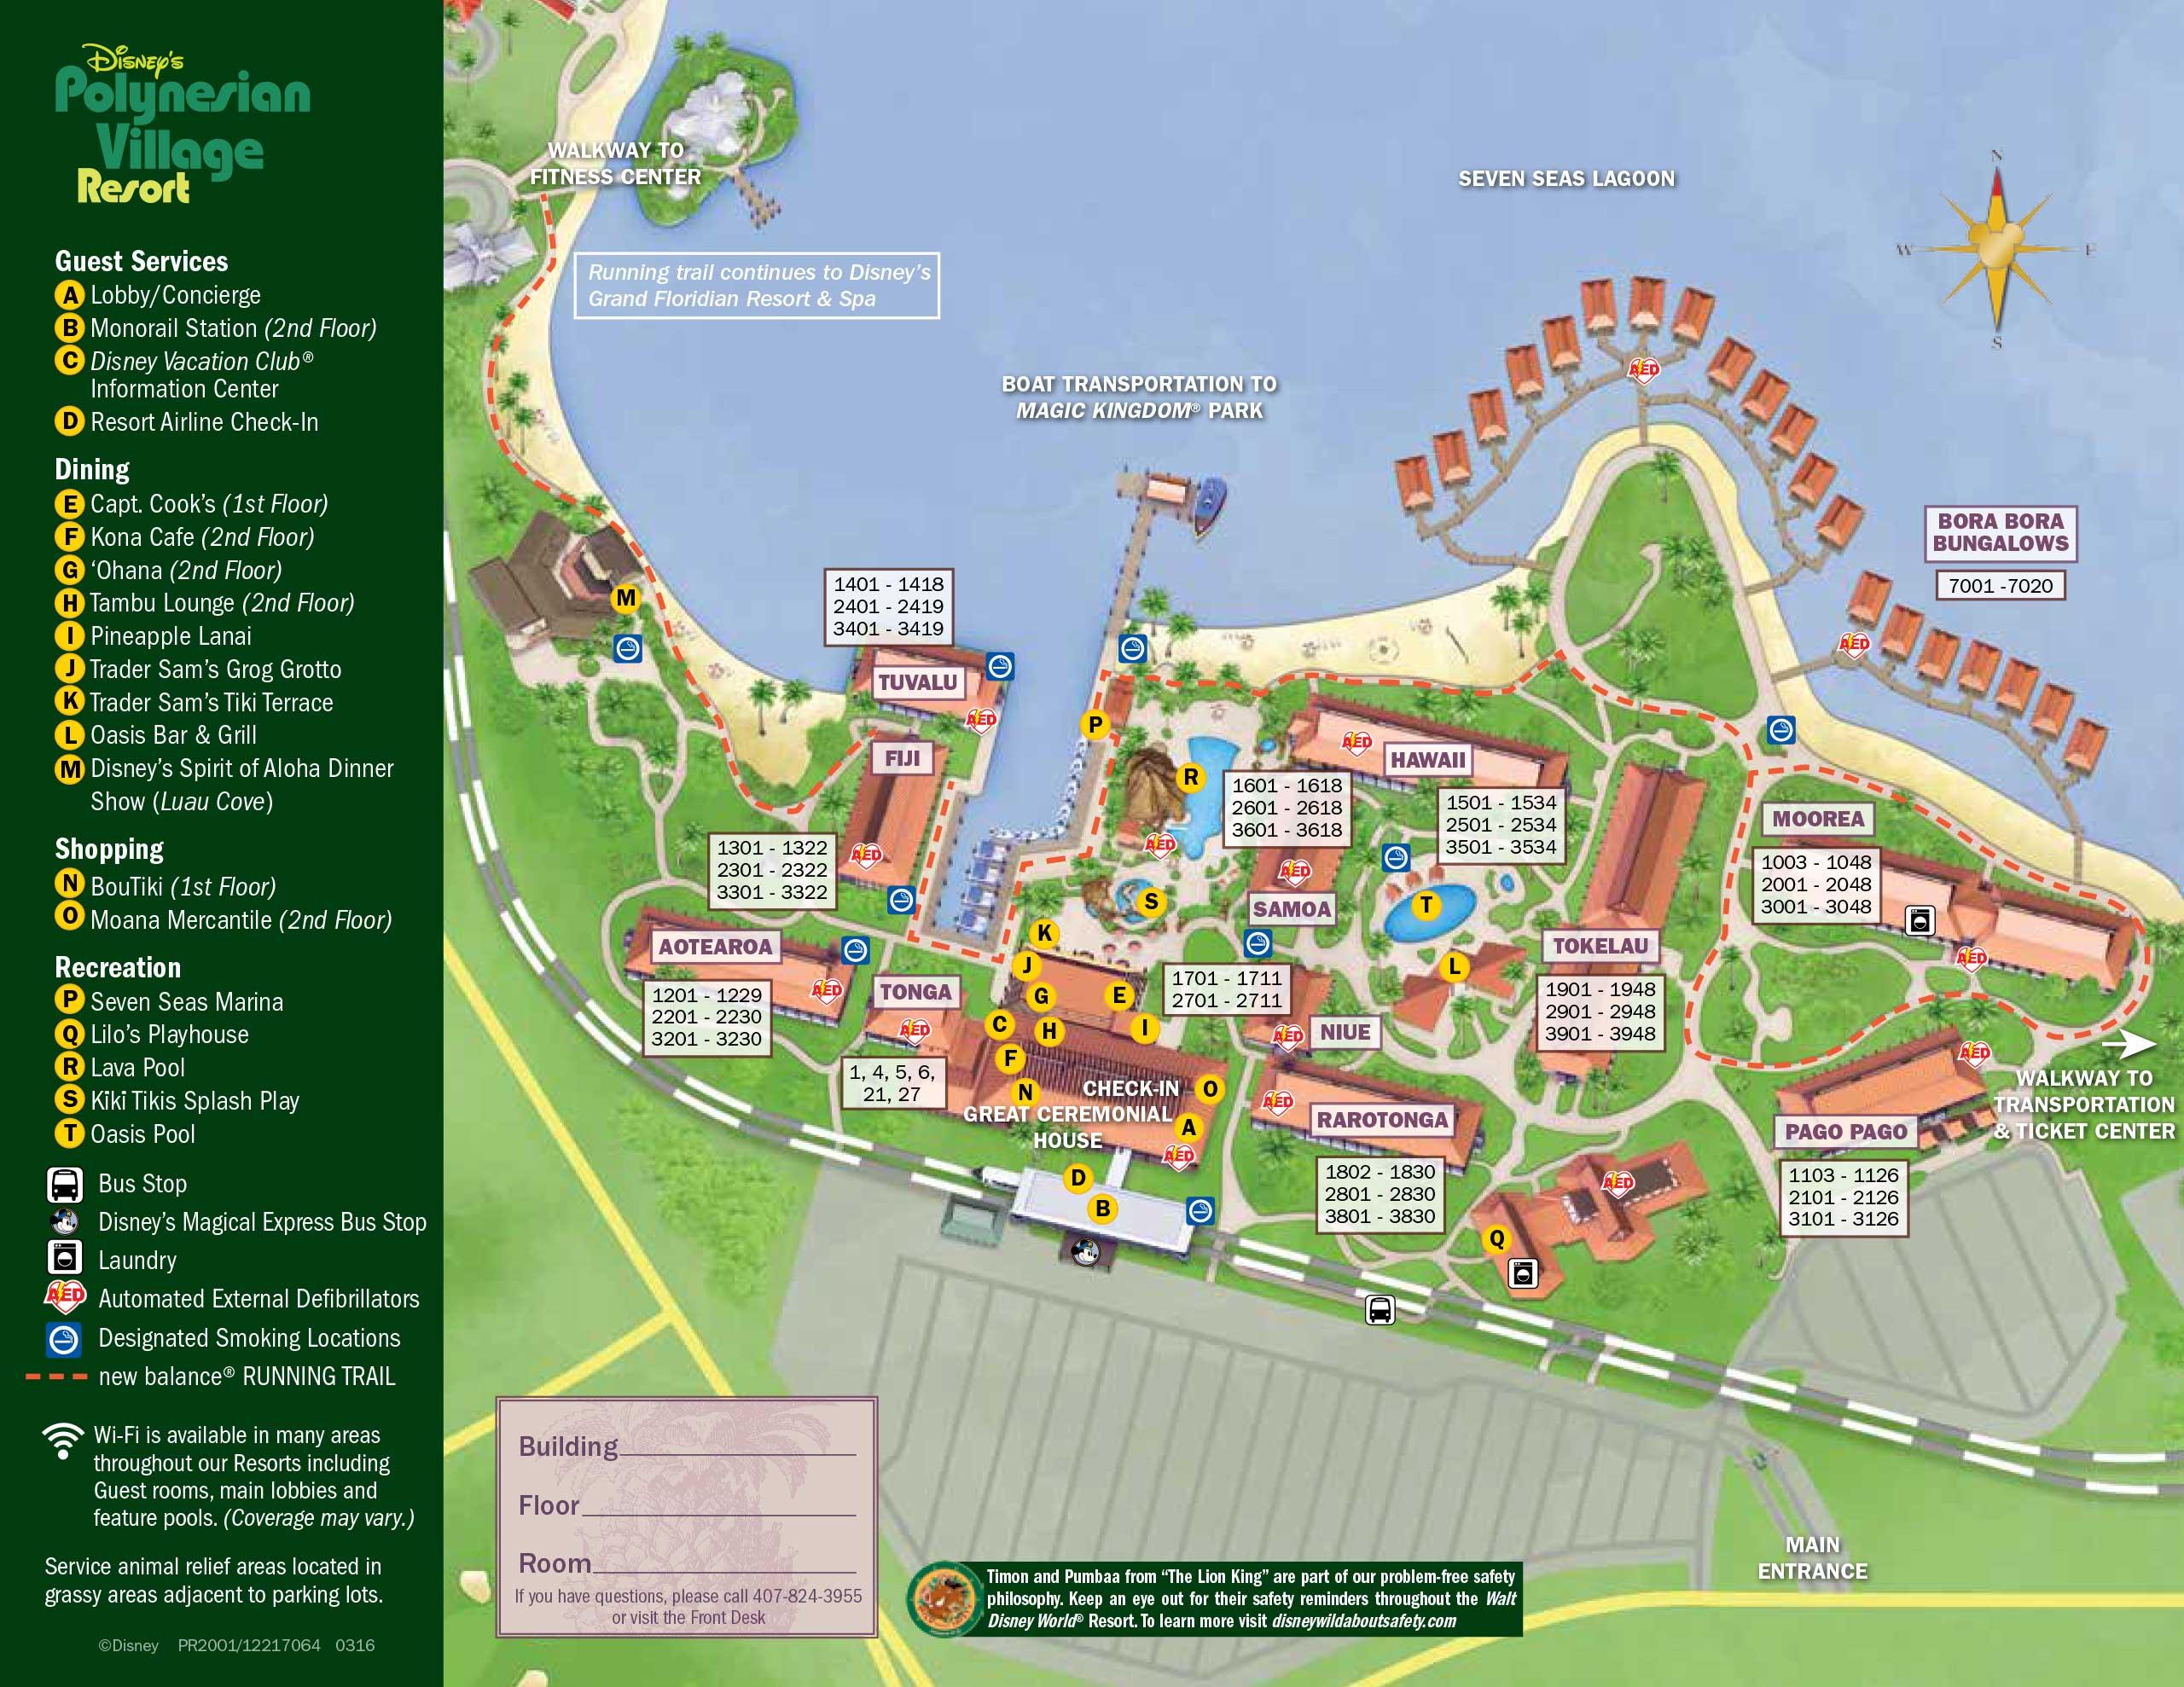 April 2017 Walt Disney World Resort Hotel Maps - 29